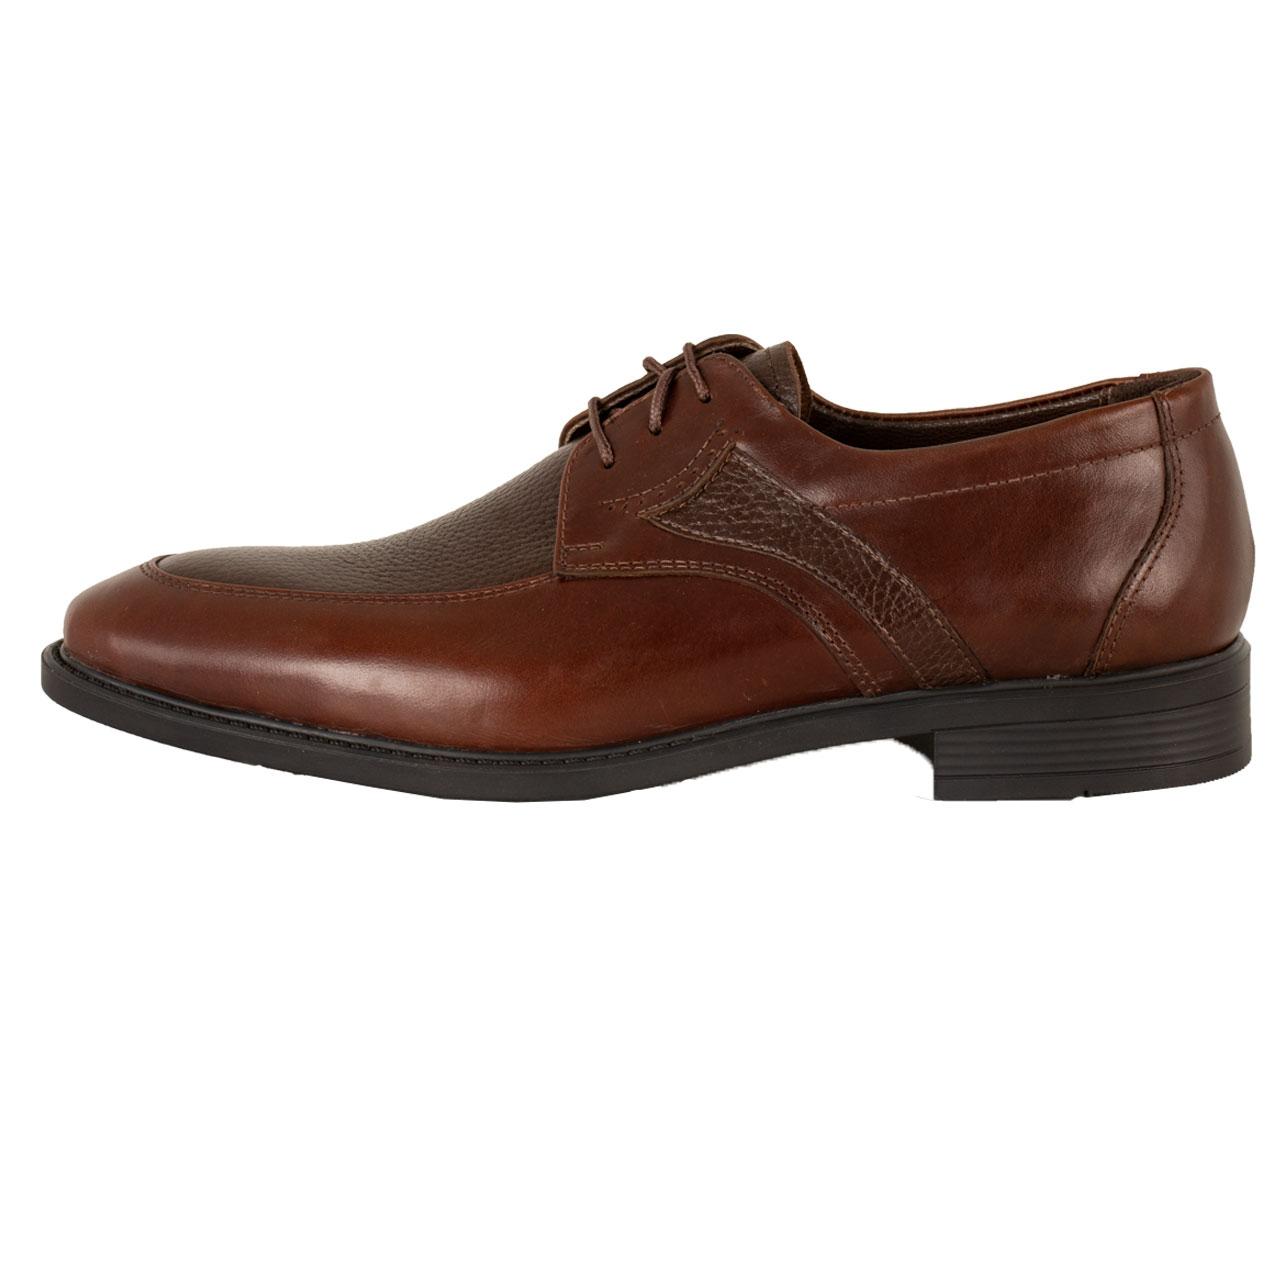 کفش مردانه پارینه چرم مدل SHO214